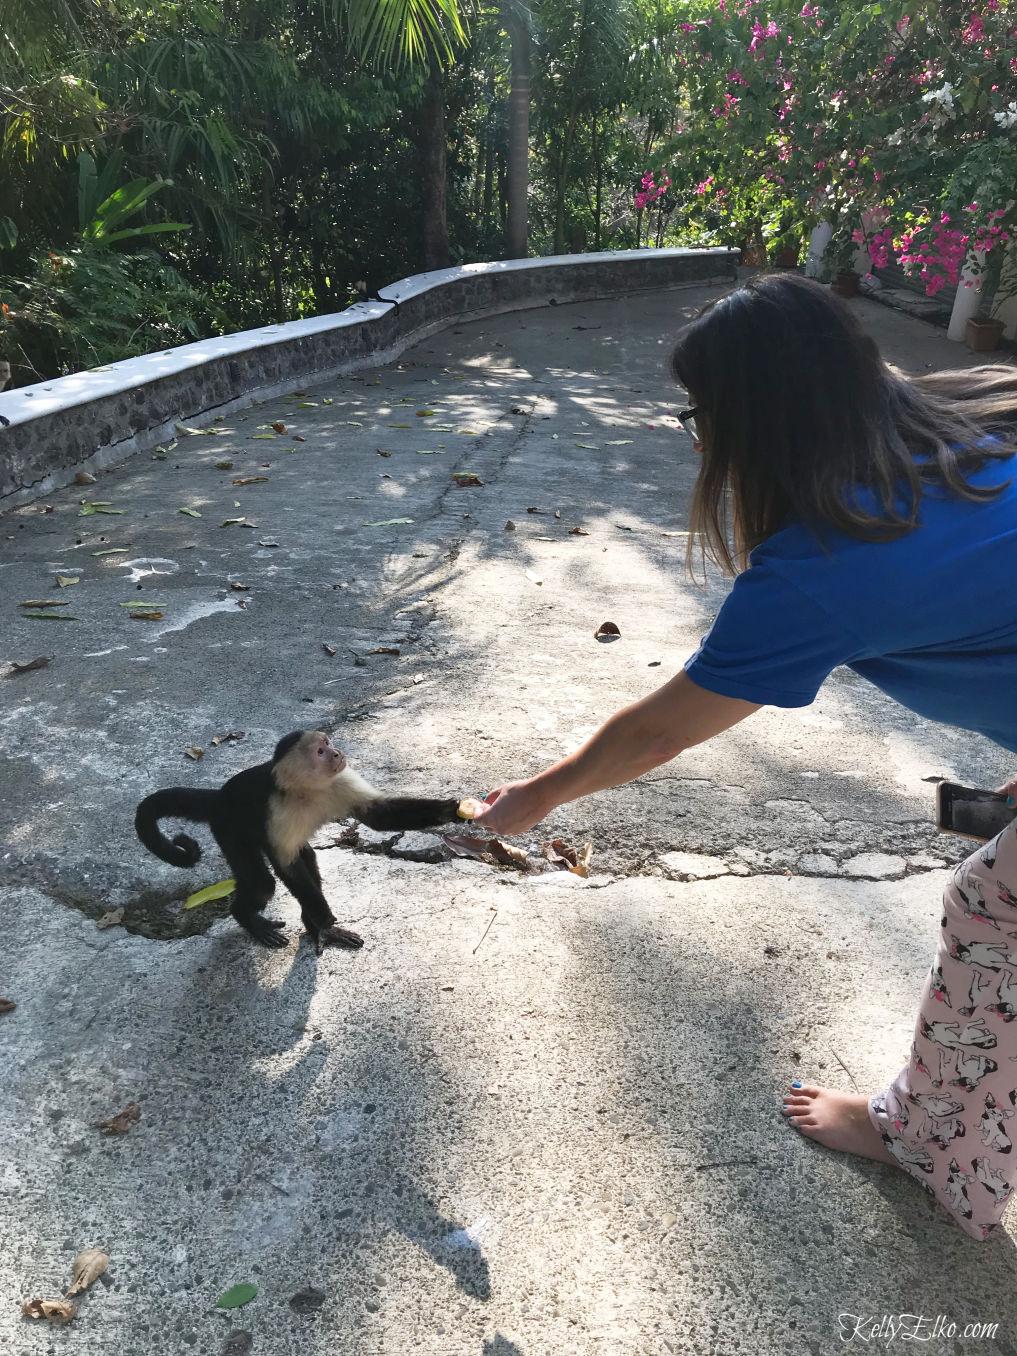 52 Weeks of Yes - hand feed wild monkeys! kellyelko.com #travel #monkeys #costarica #vacation #travelblog #52WeeksofYes